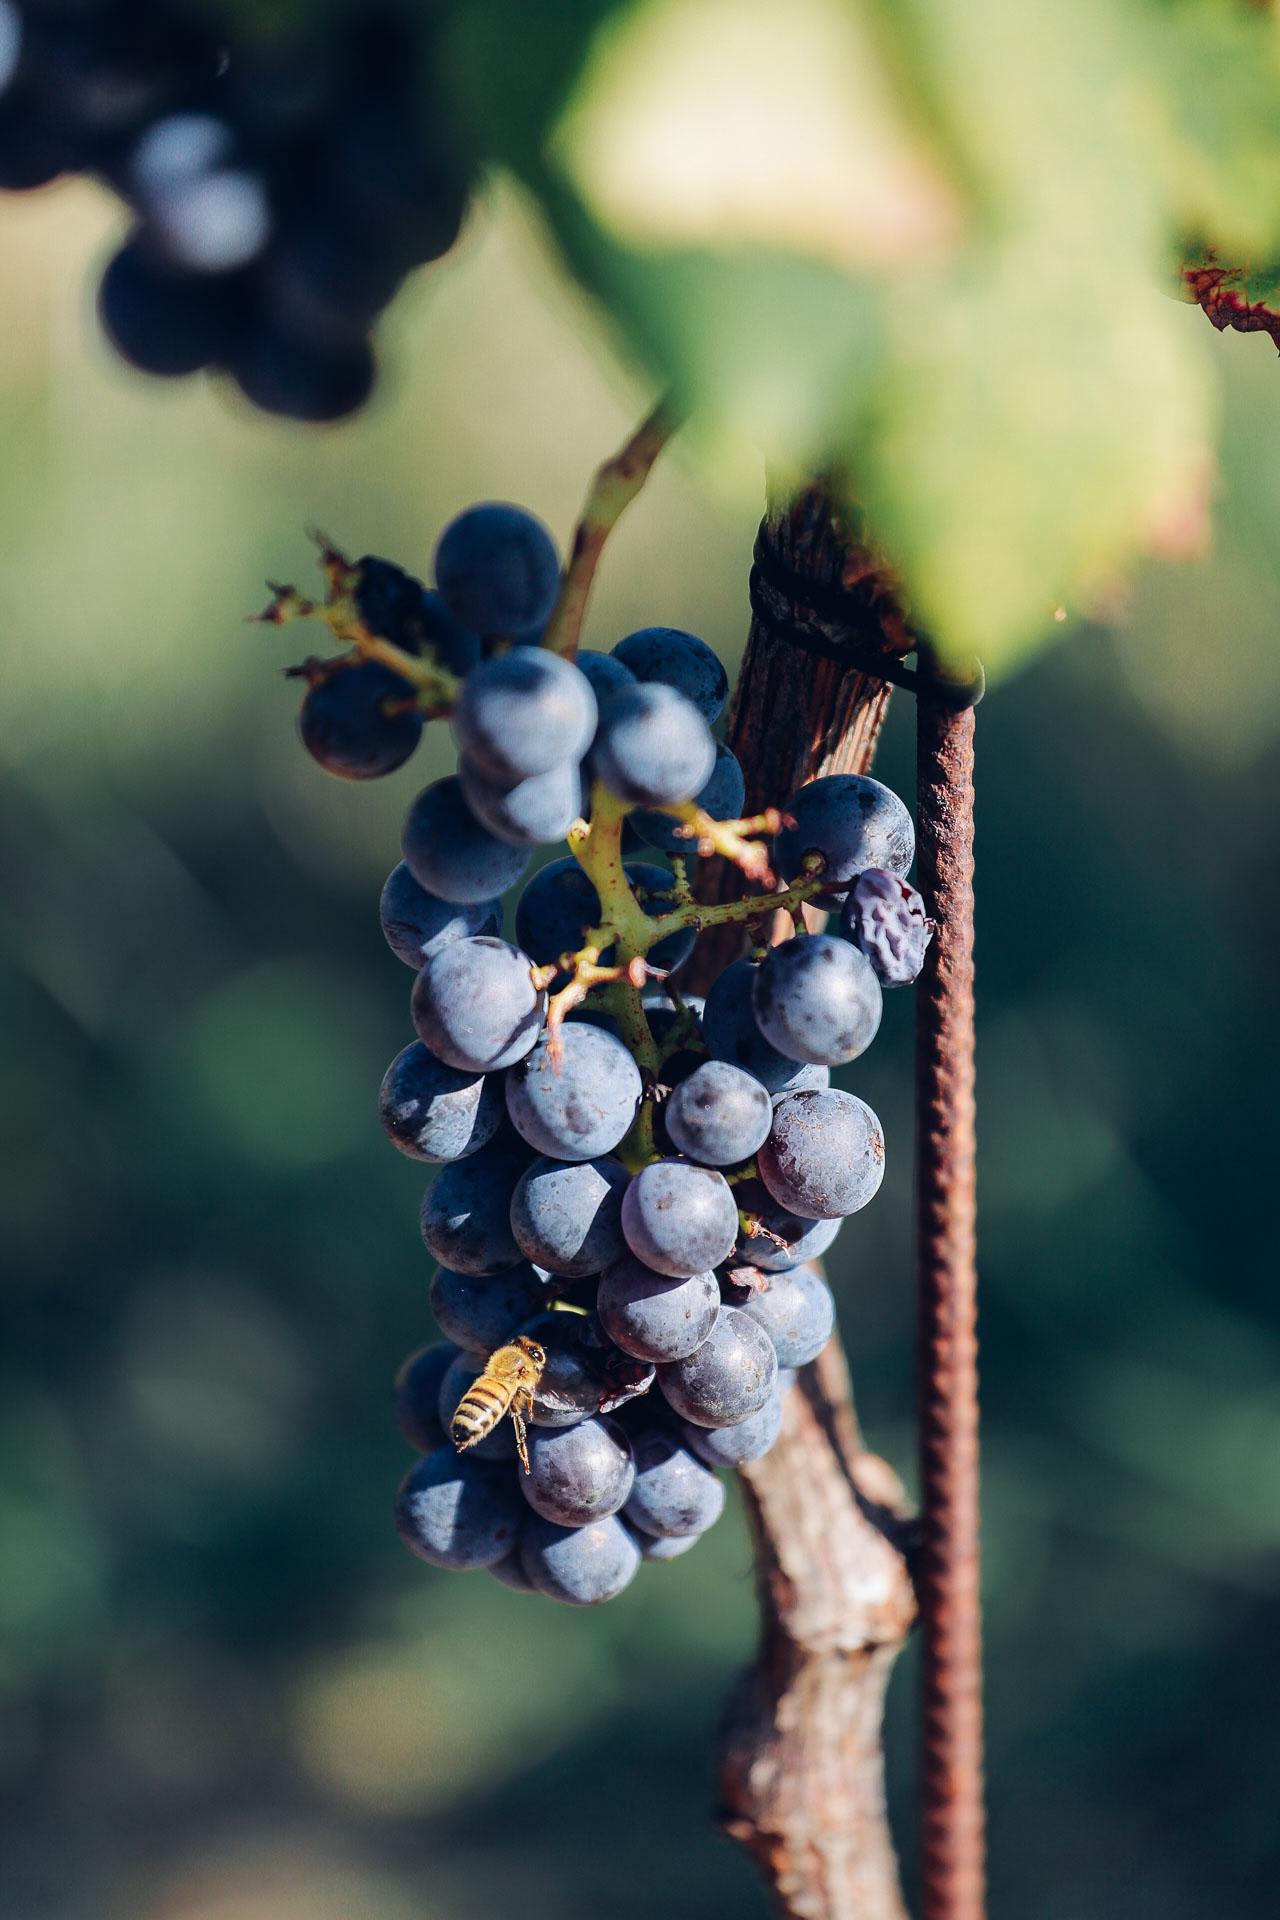 009-Sauro-maule-wineyards-organic-harvest-2016-_RUI7267_p_Lr_web_HD